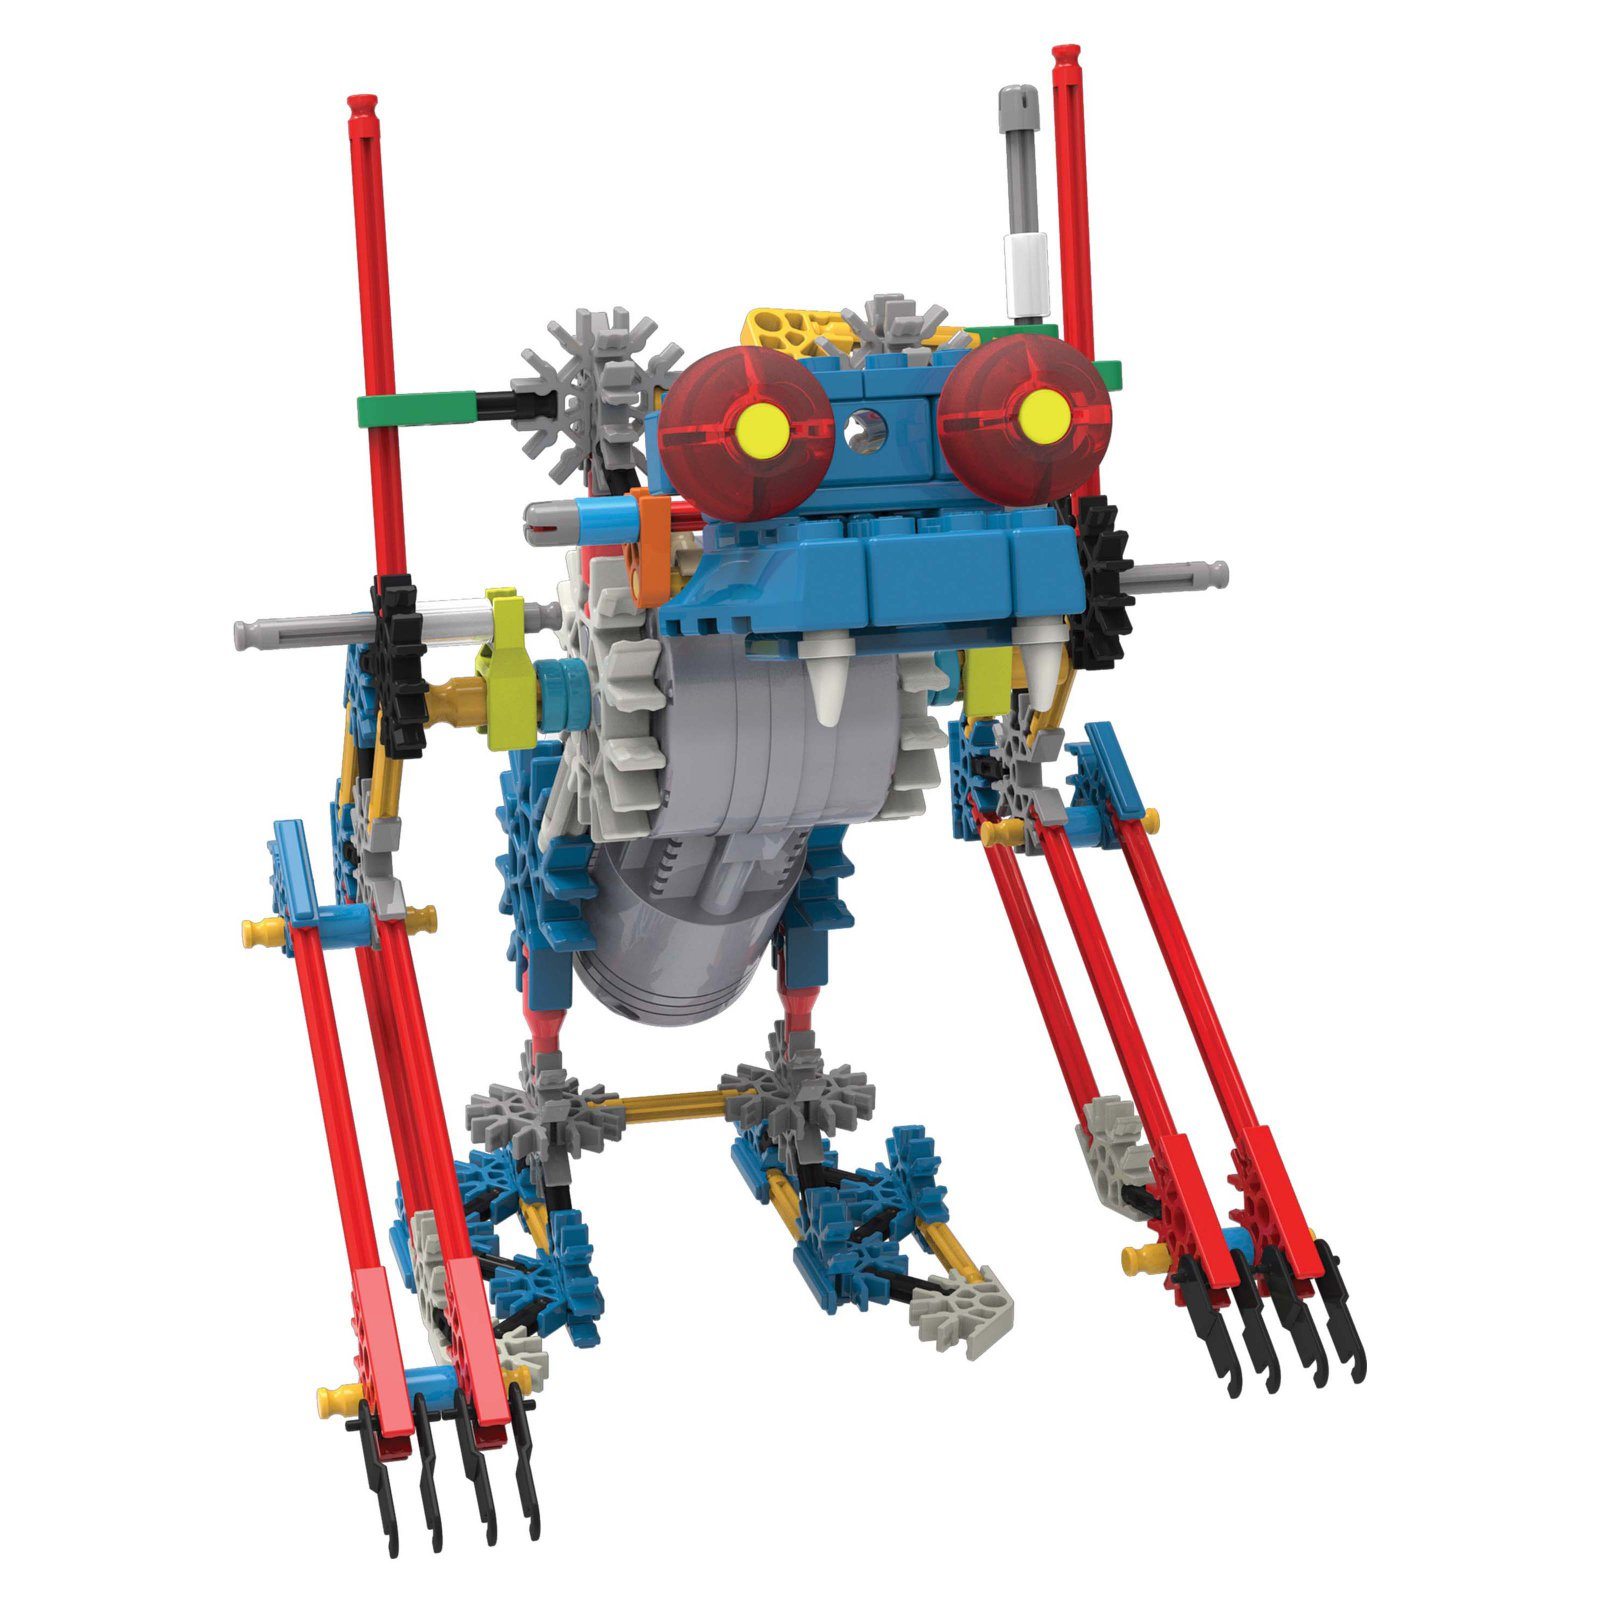 Knex Robo-Smash Building Set by K'NEX